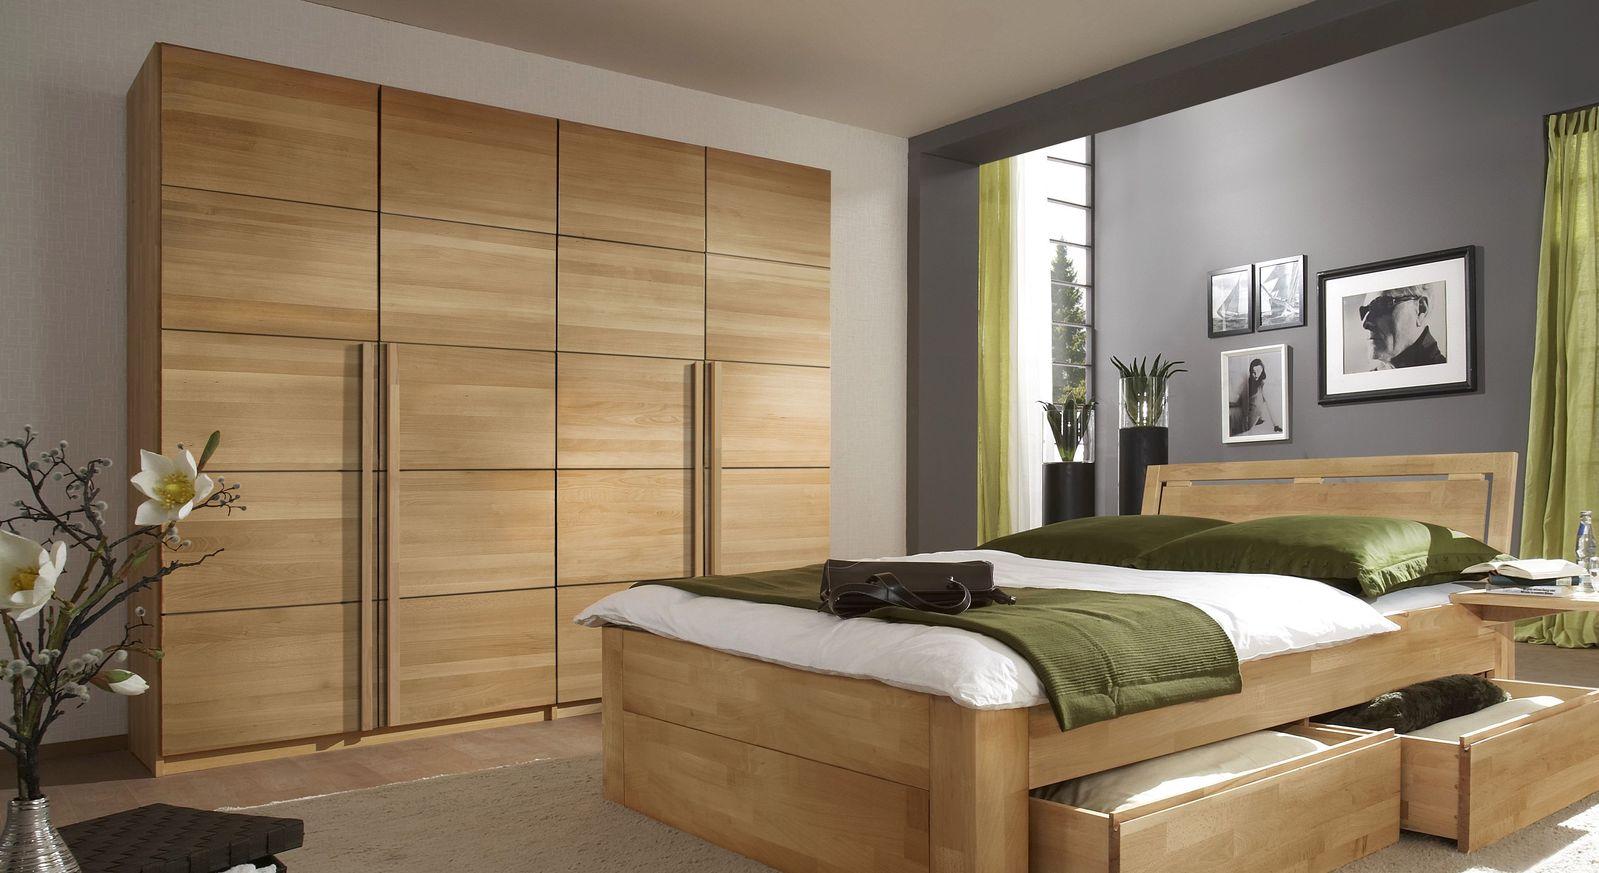 Drehtüren-Kleiderschrank Andalucia aus massivem Buchenholz